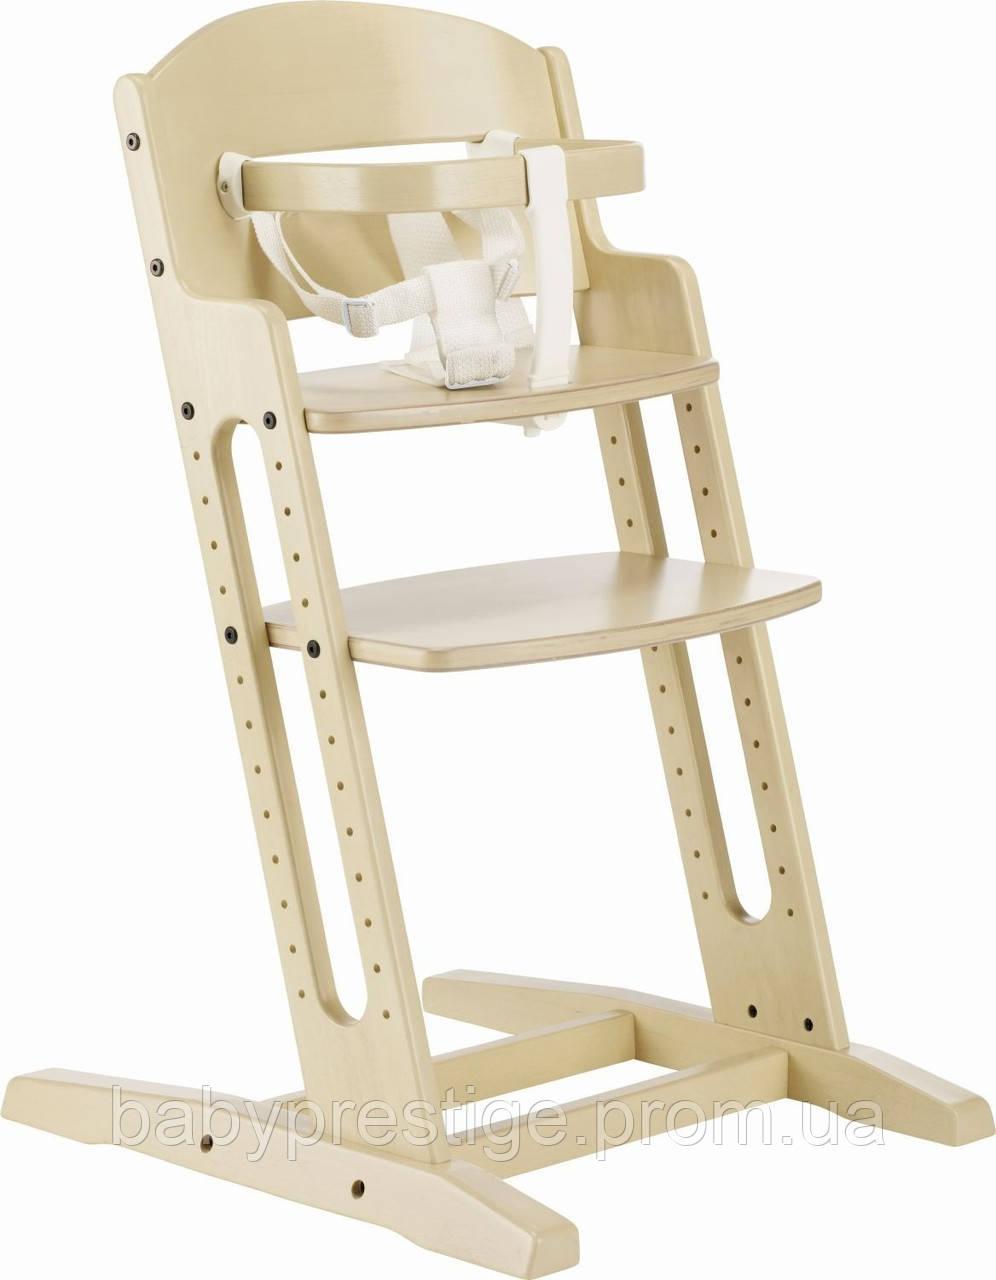 Стульчик для кормления Baby DanChair White wash.